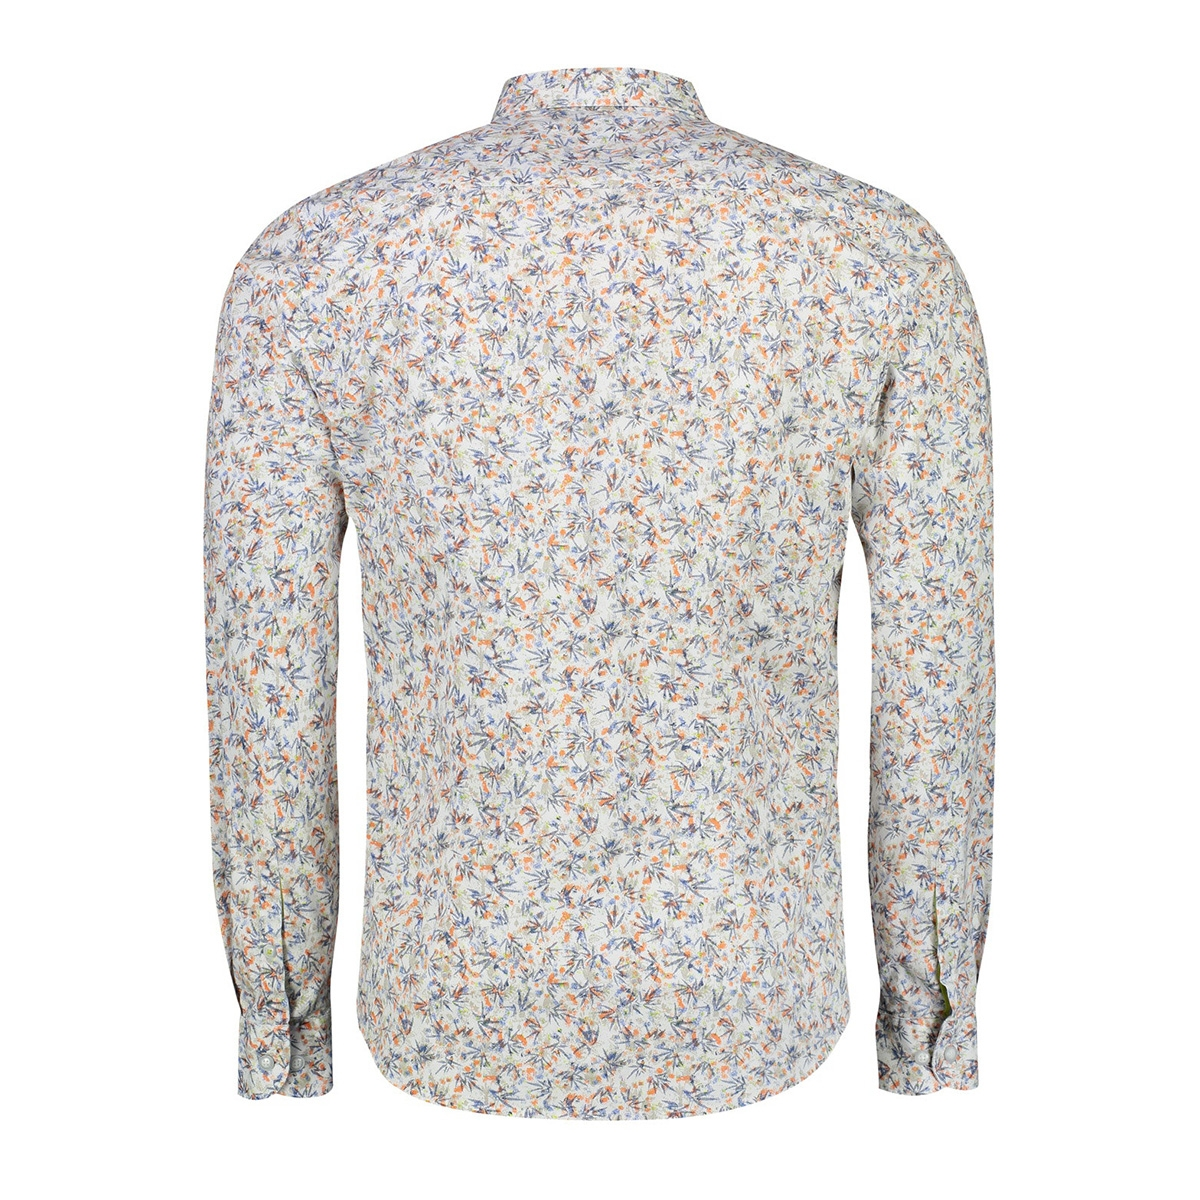 overhemd met print 2021133 lerros overhemd 925